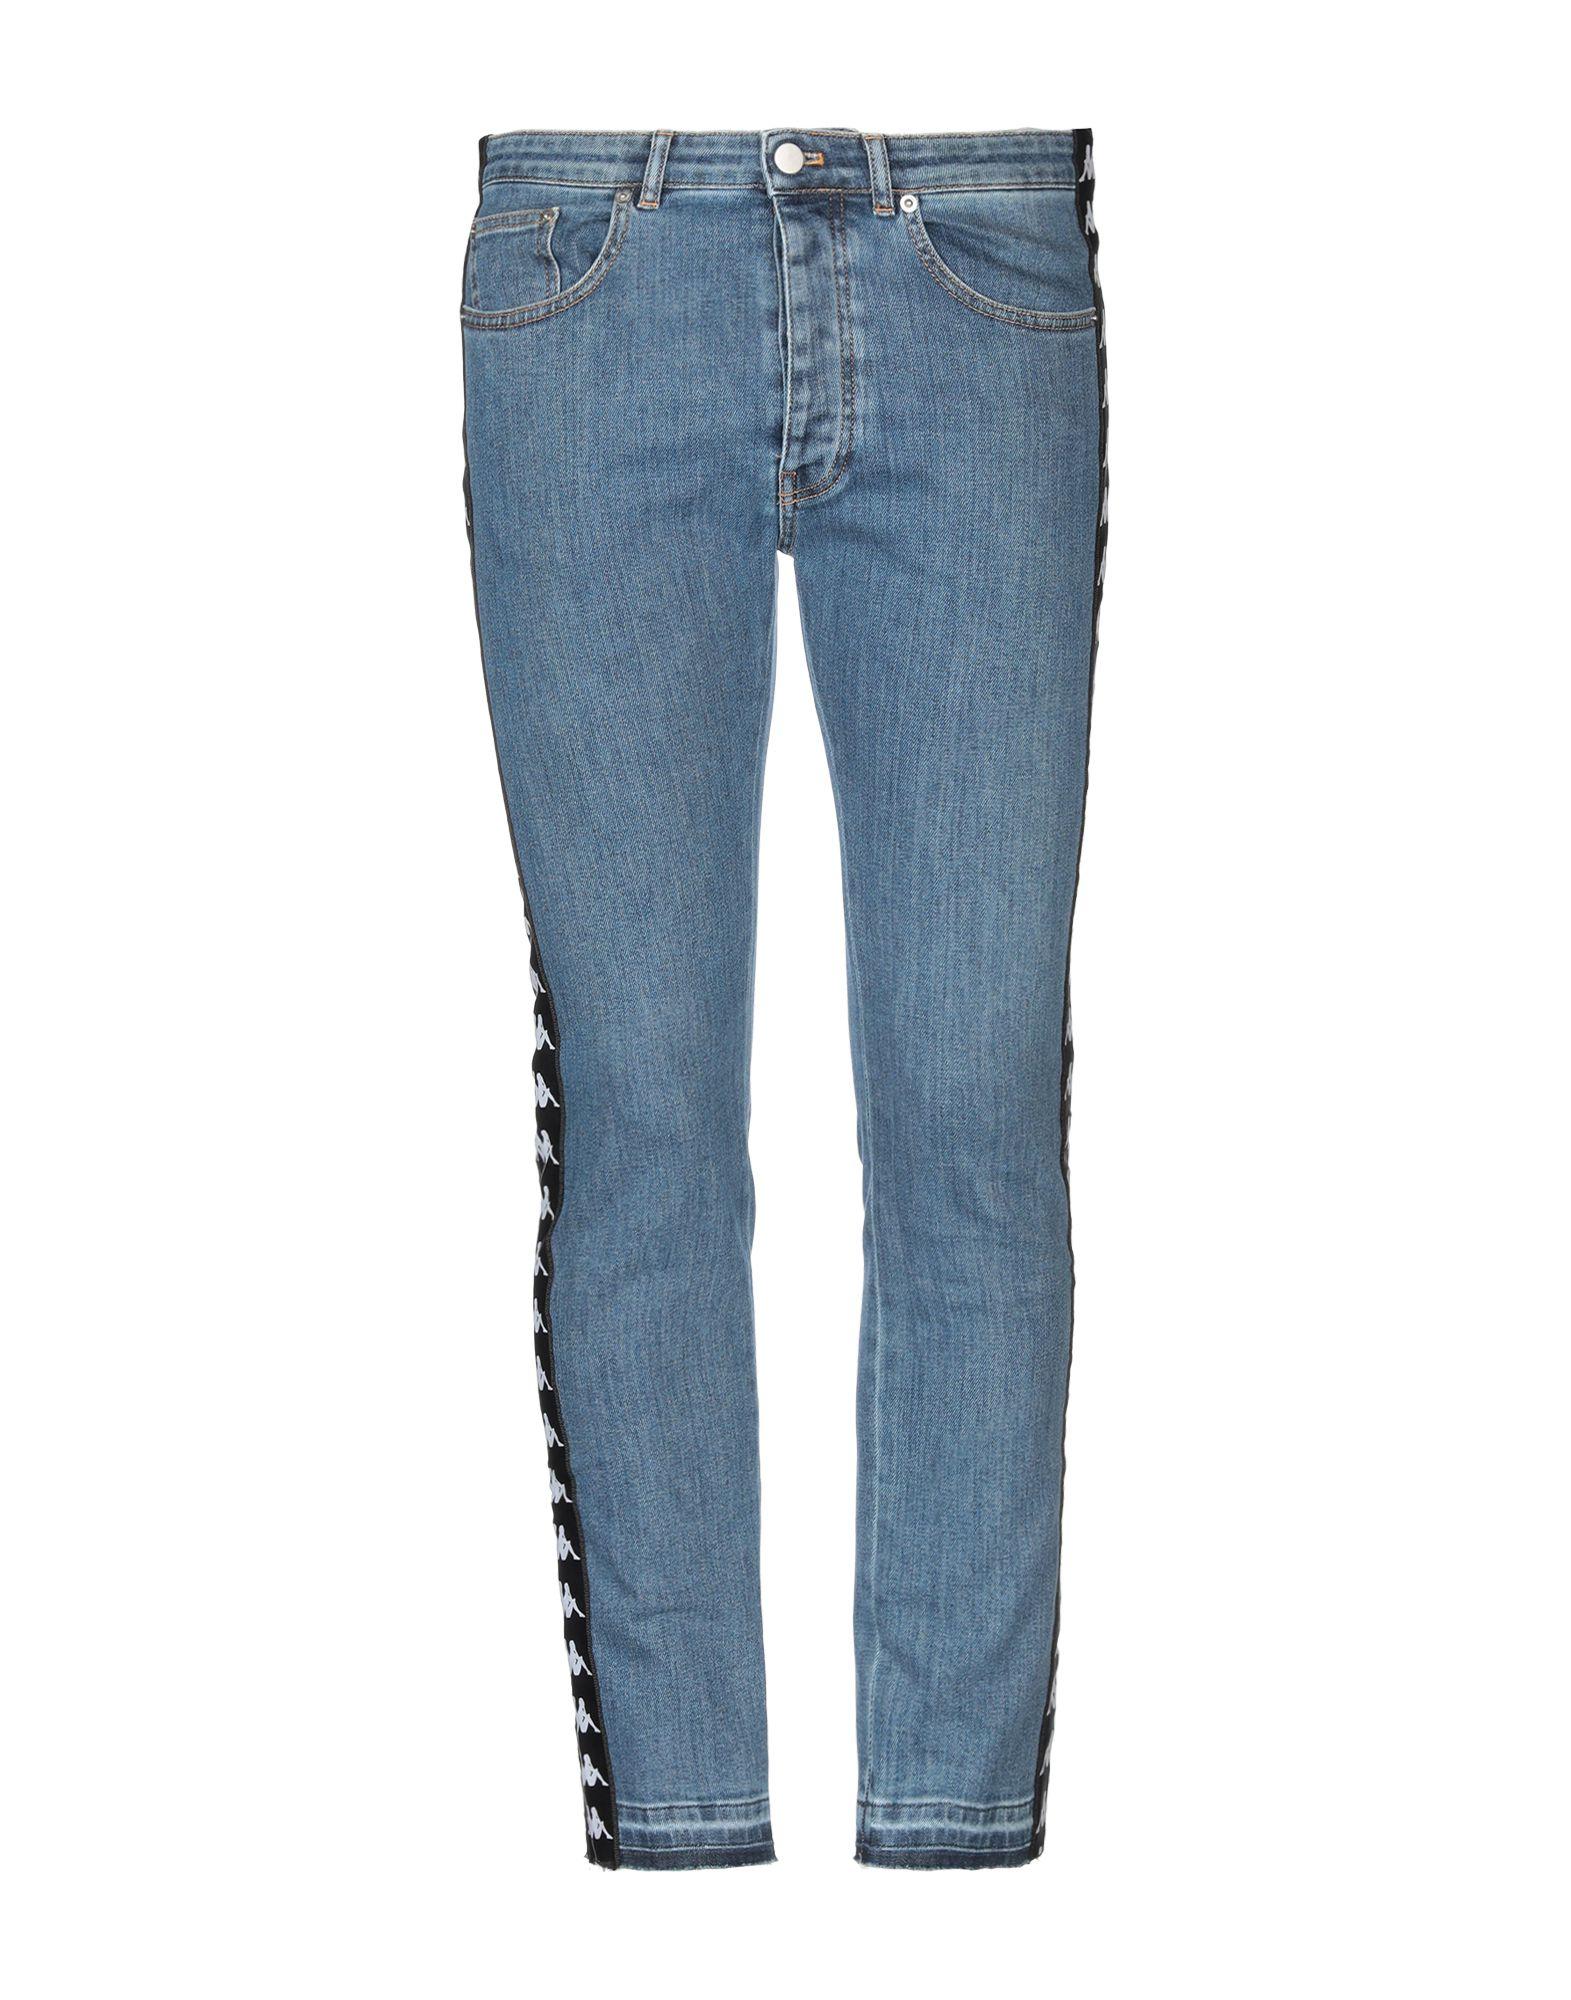 K KONTROLL Джинсовые брюки k kontroll повседневные брюки